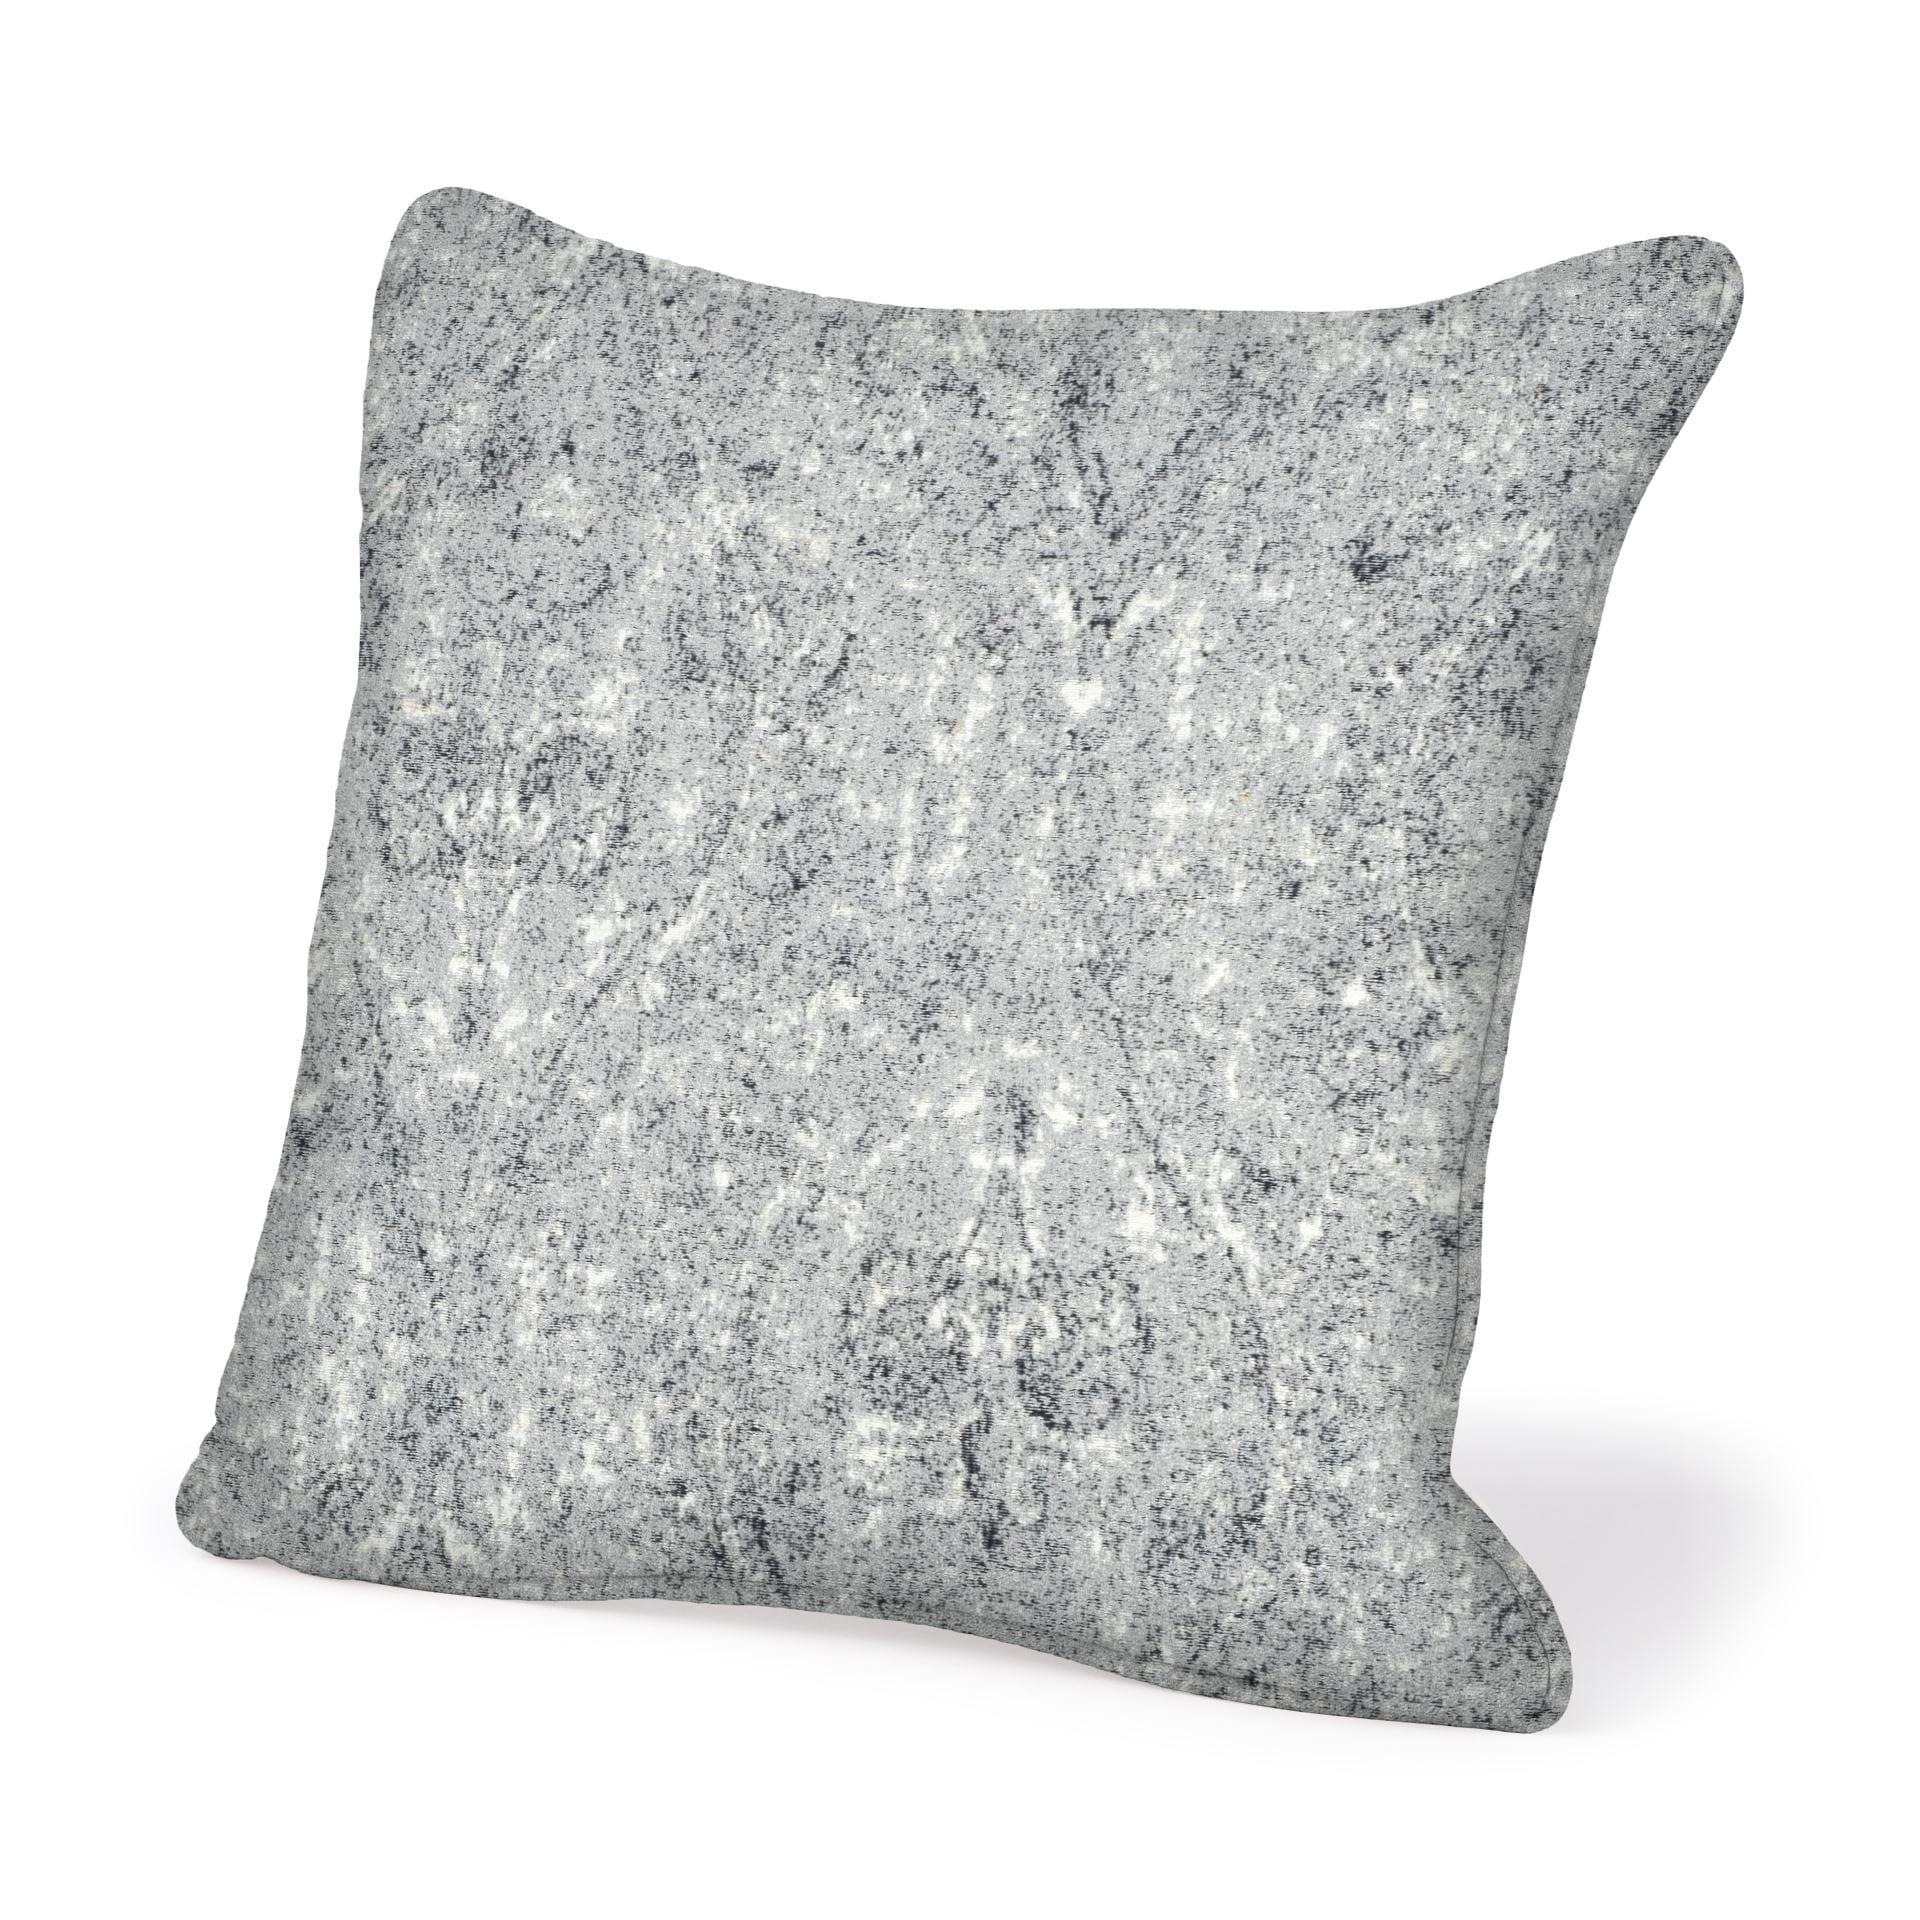 Mercana Chrysanthemum III 22 x 22 (cover only) Decorative Pillow